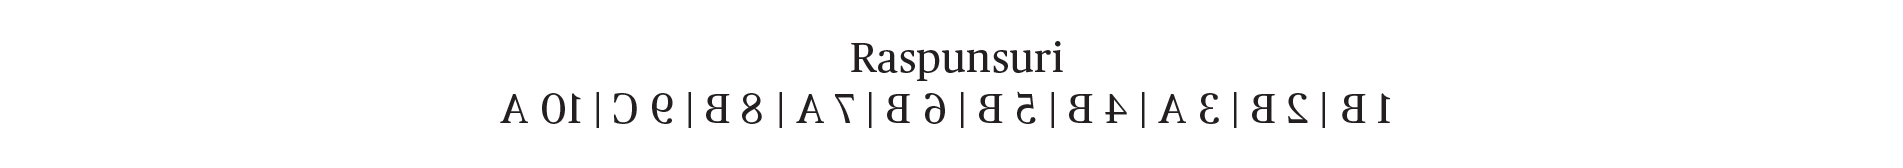 Raspunsuri_Quizz_Nutritie.jpg